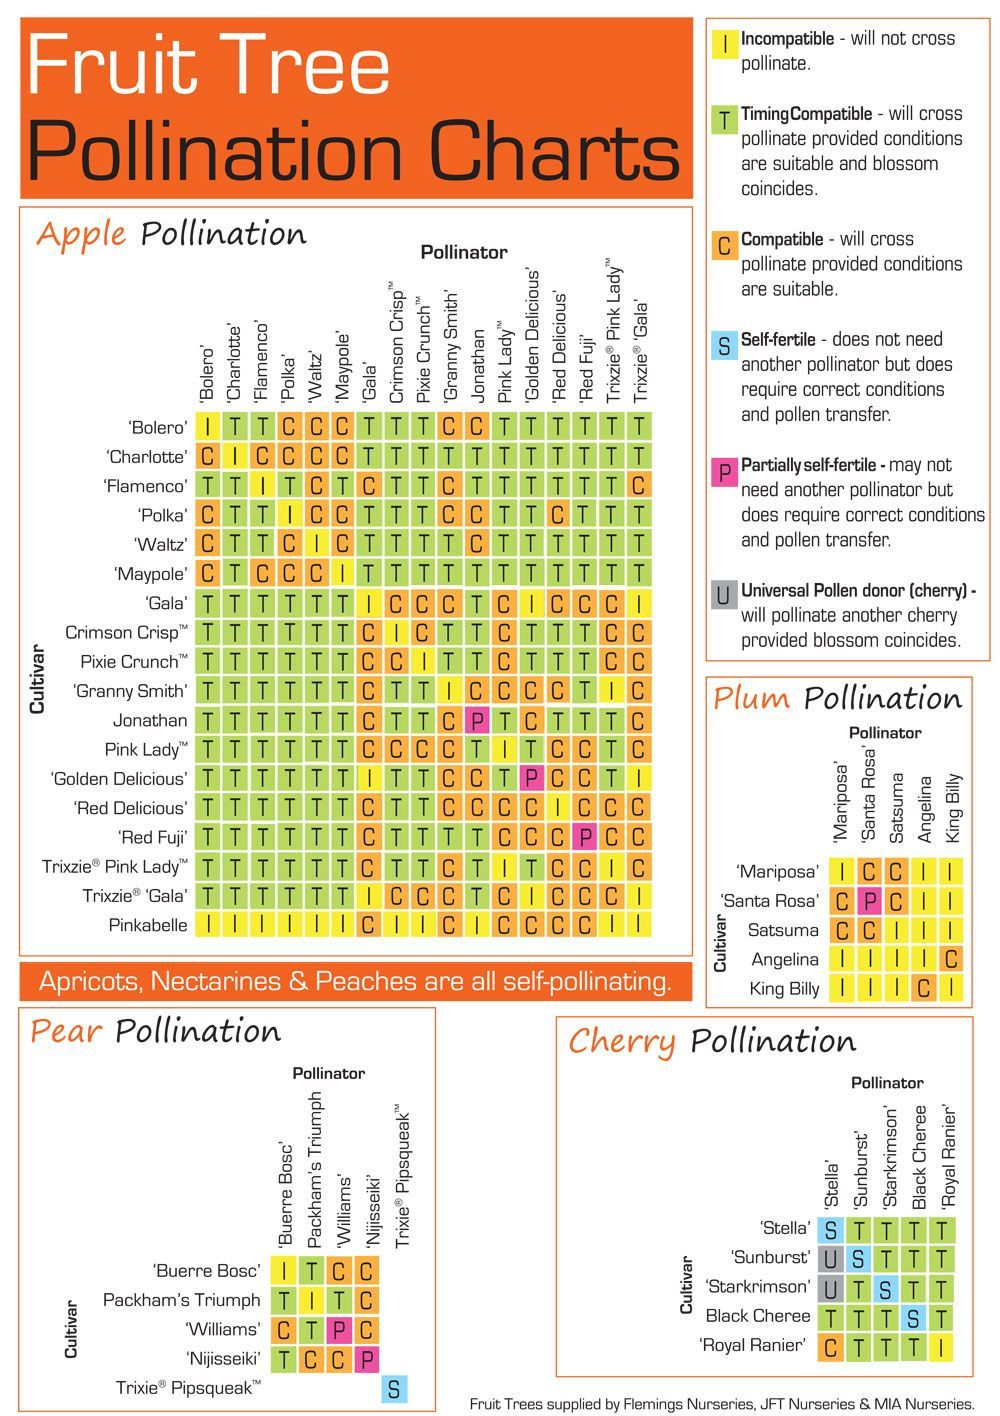 Fruit Tree Pollination Chart Australia Google Search Fruit Trees Pollination Fruit